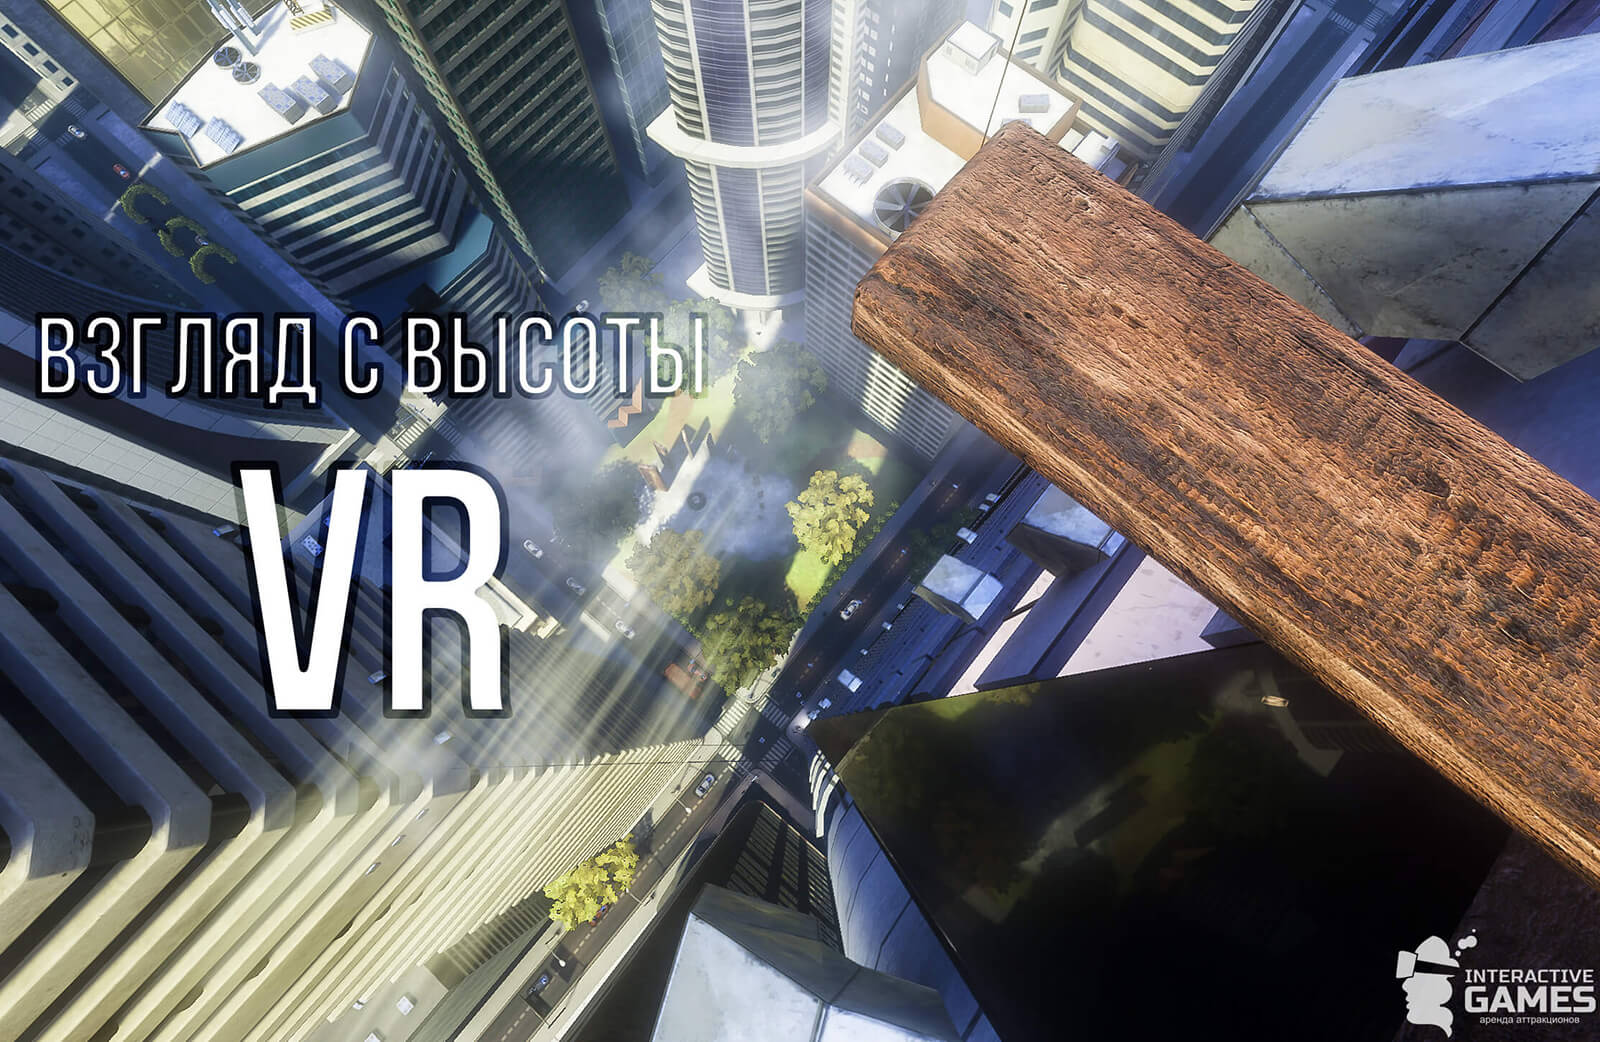 Взгляд с высоты VR